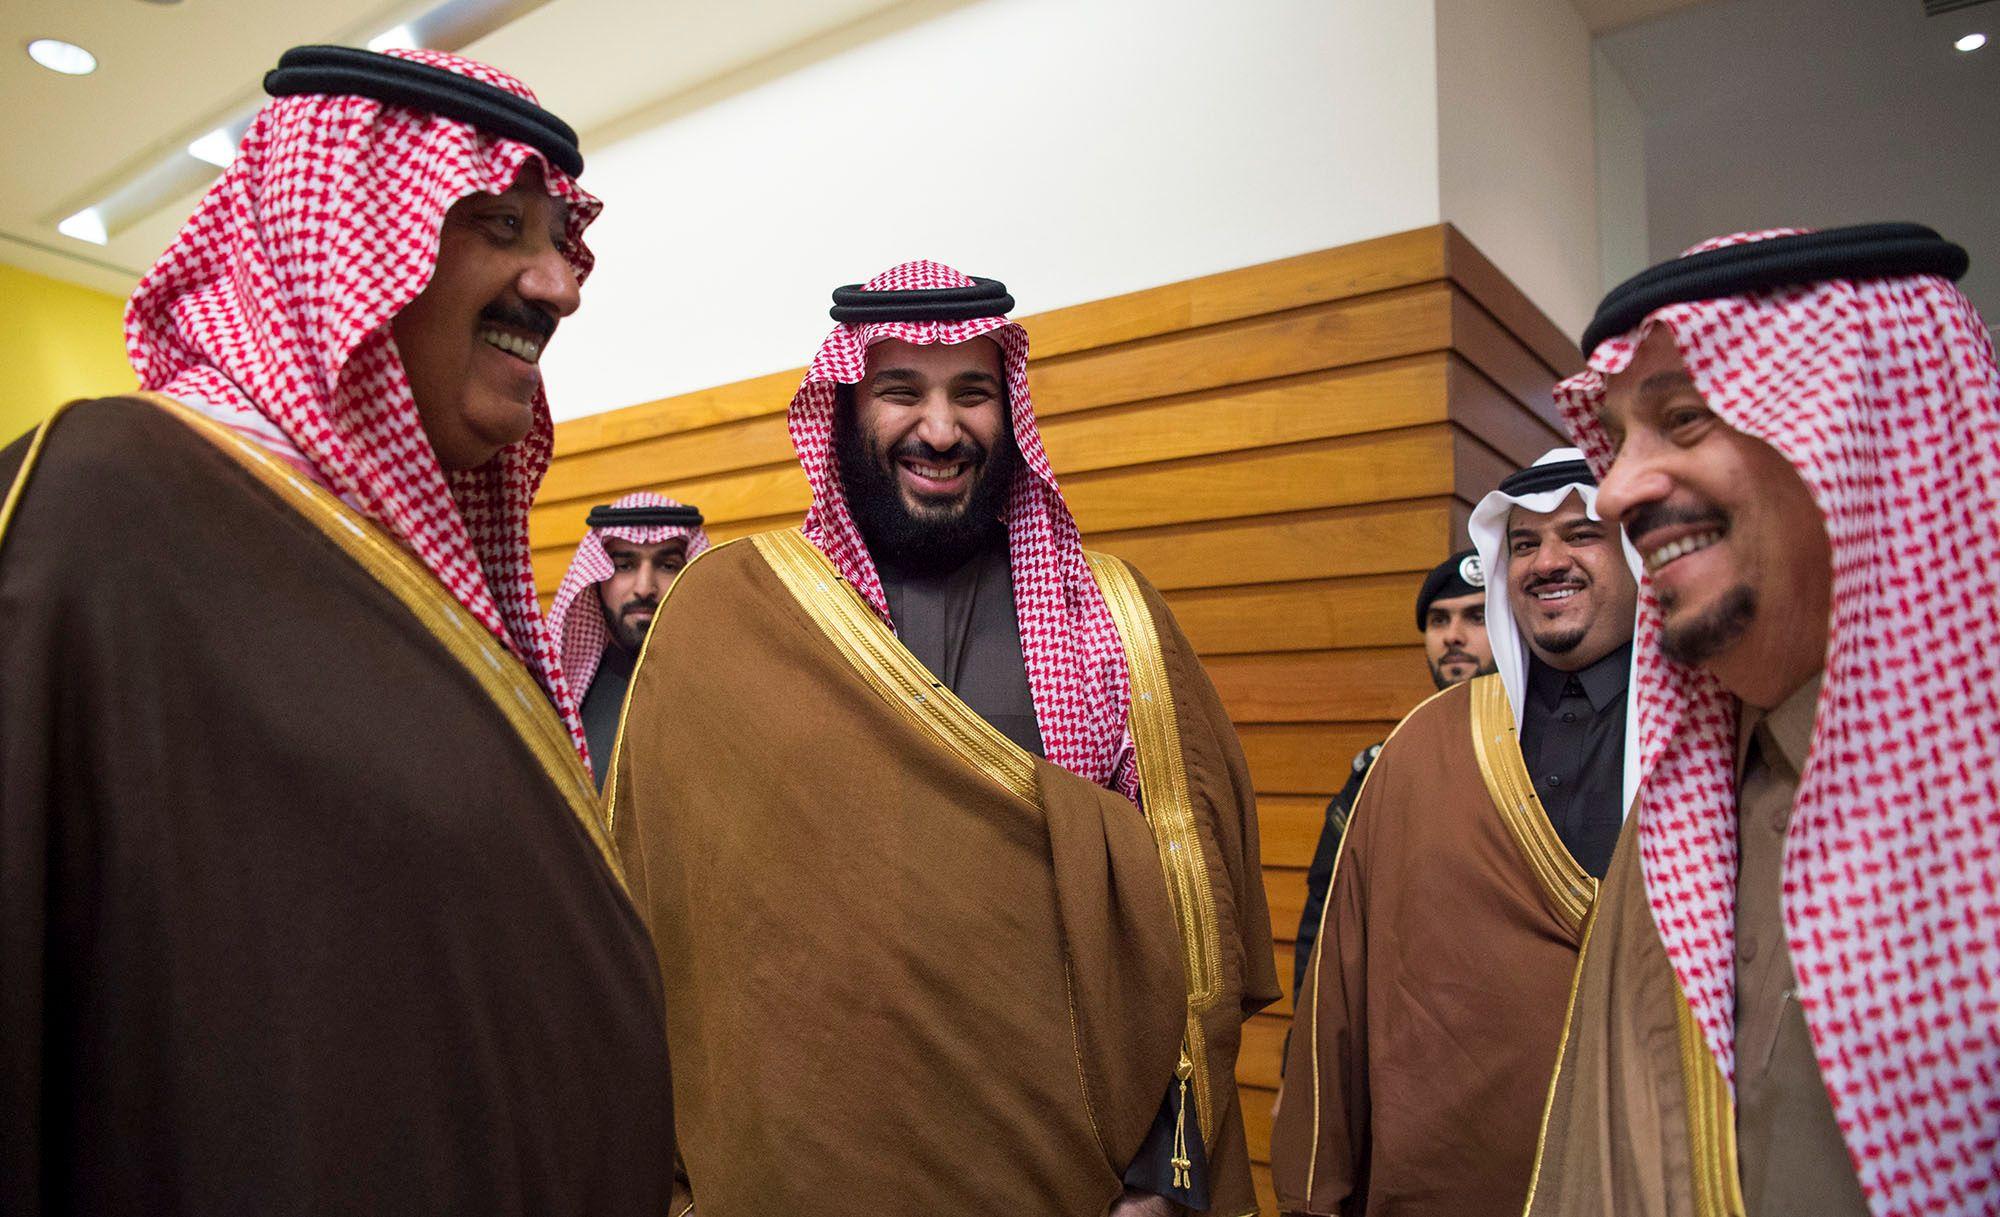 Saudi Arabia May Get $100 Billion From Jailed Princes and